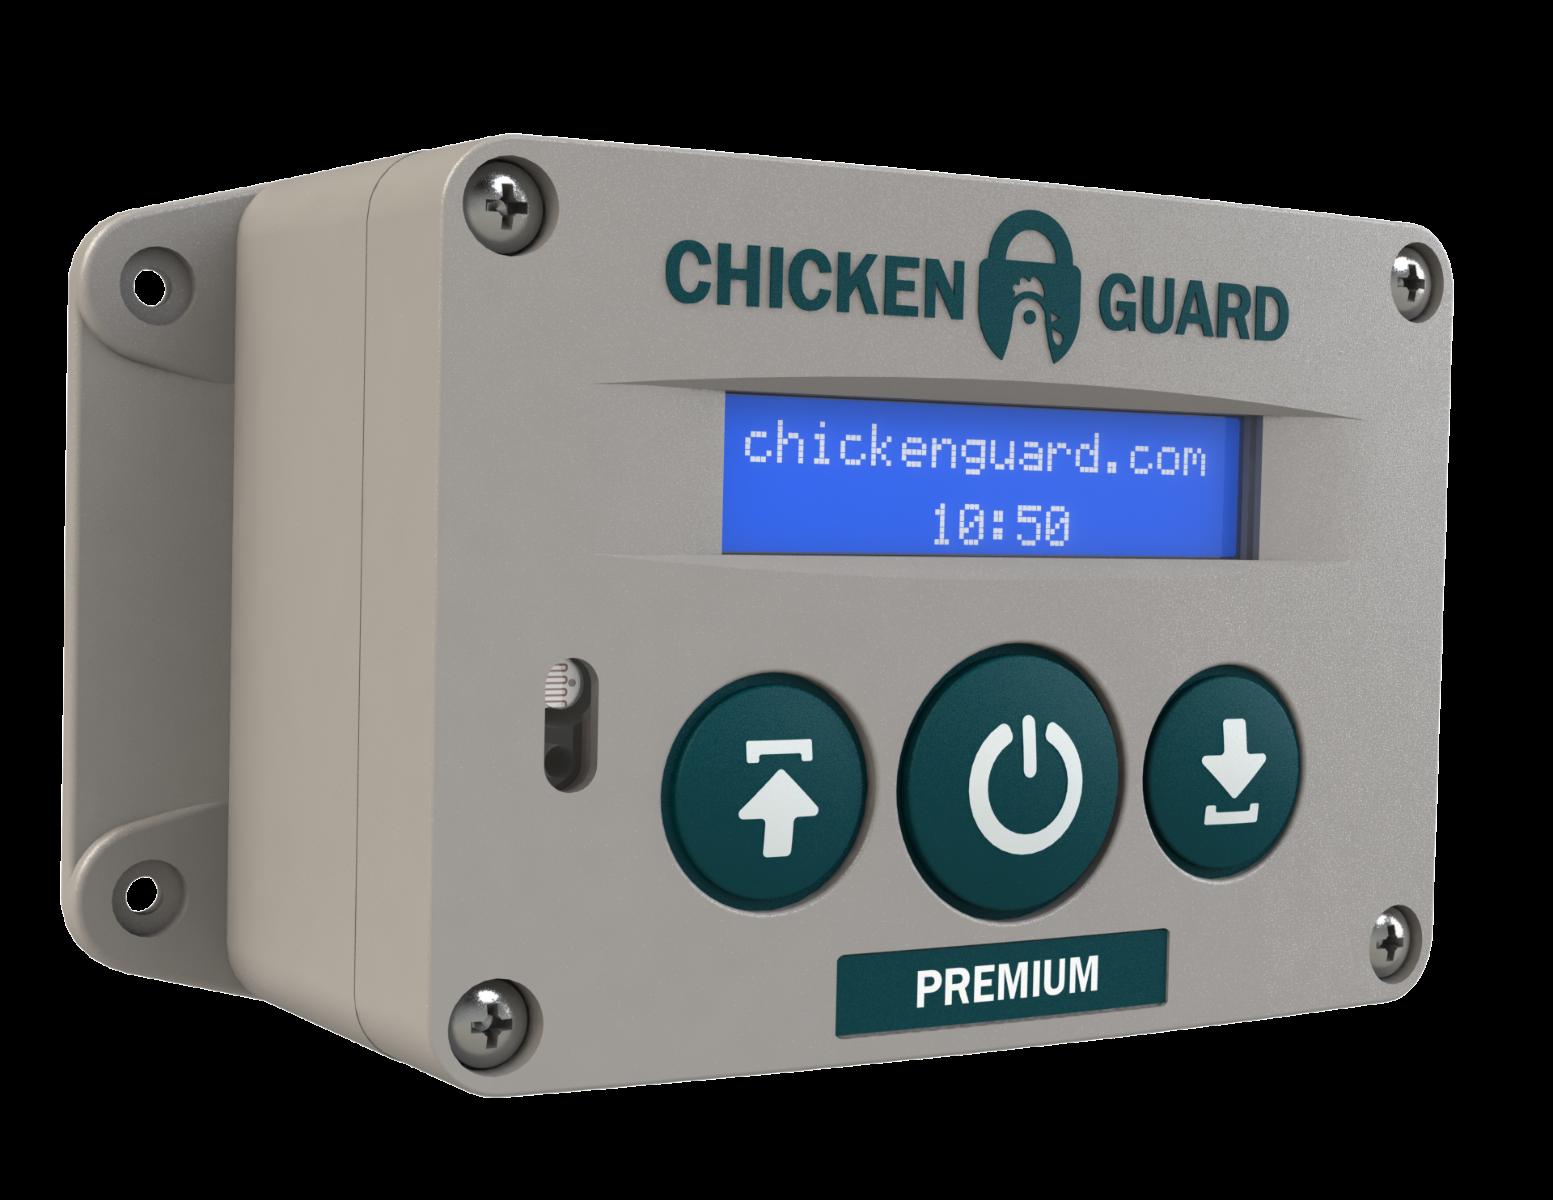 ChickenGuard Premium Version Automatic Door Opener